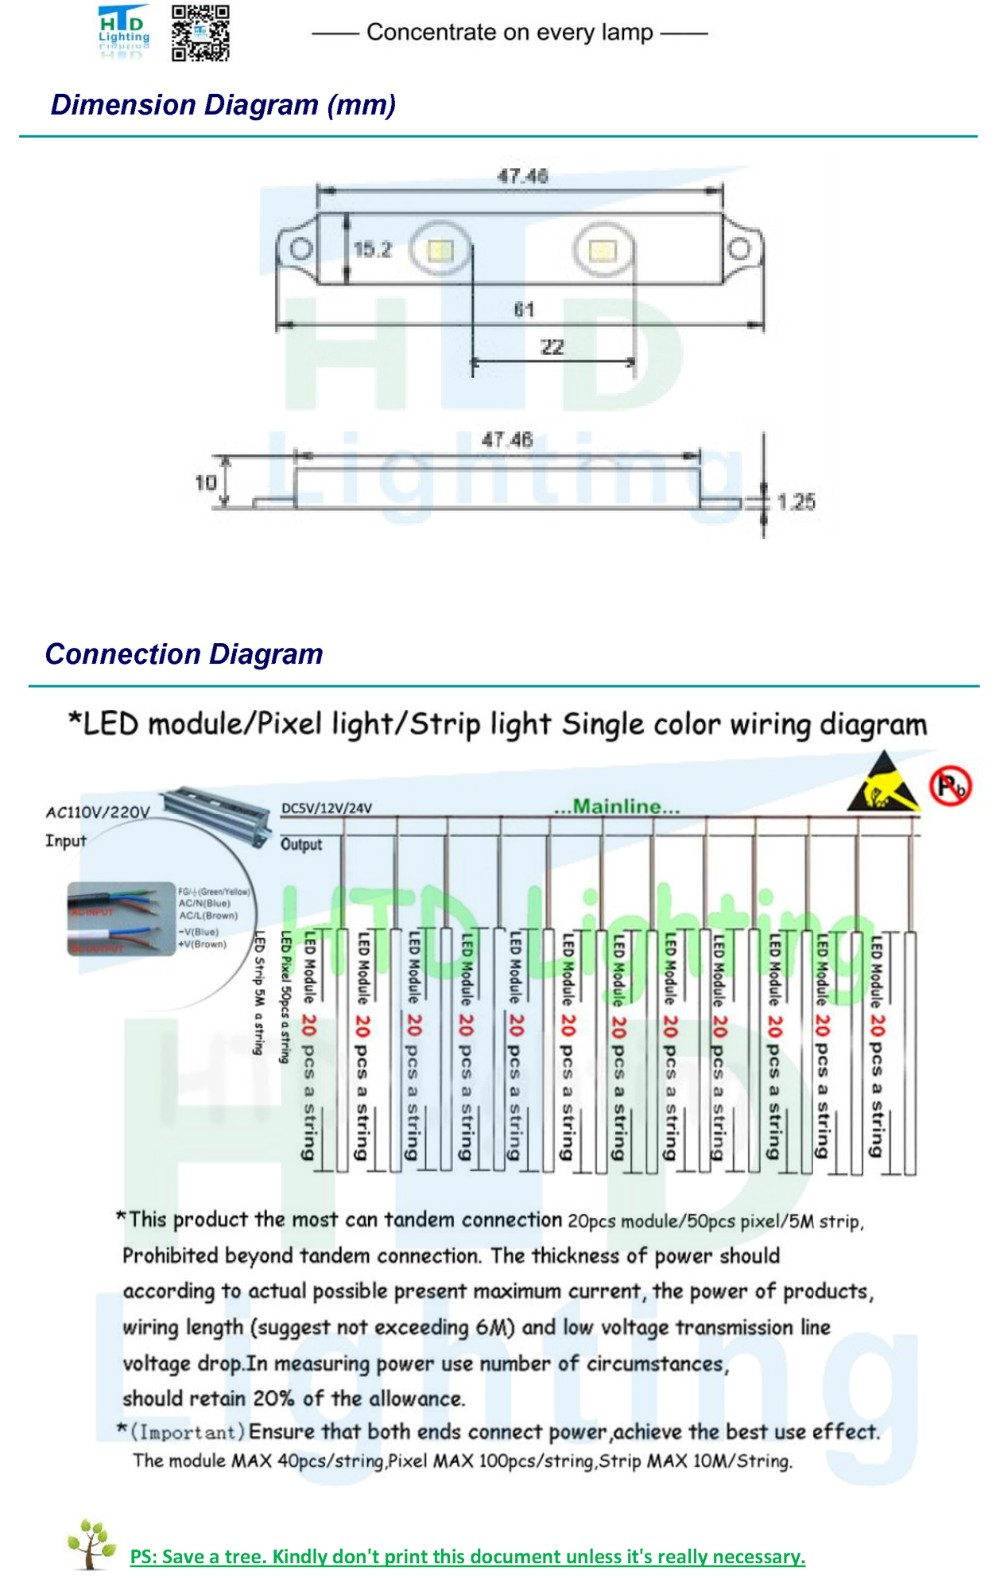 12v Dc 2538 Led Pixel Module With Samsung Chips Buy High Quality Wiring Diagram Htd 4512 2835a Smd2835 160lens 2leds Spec 3